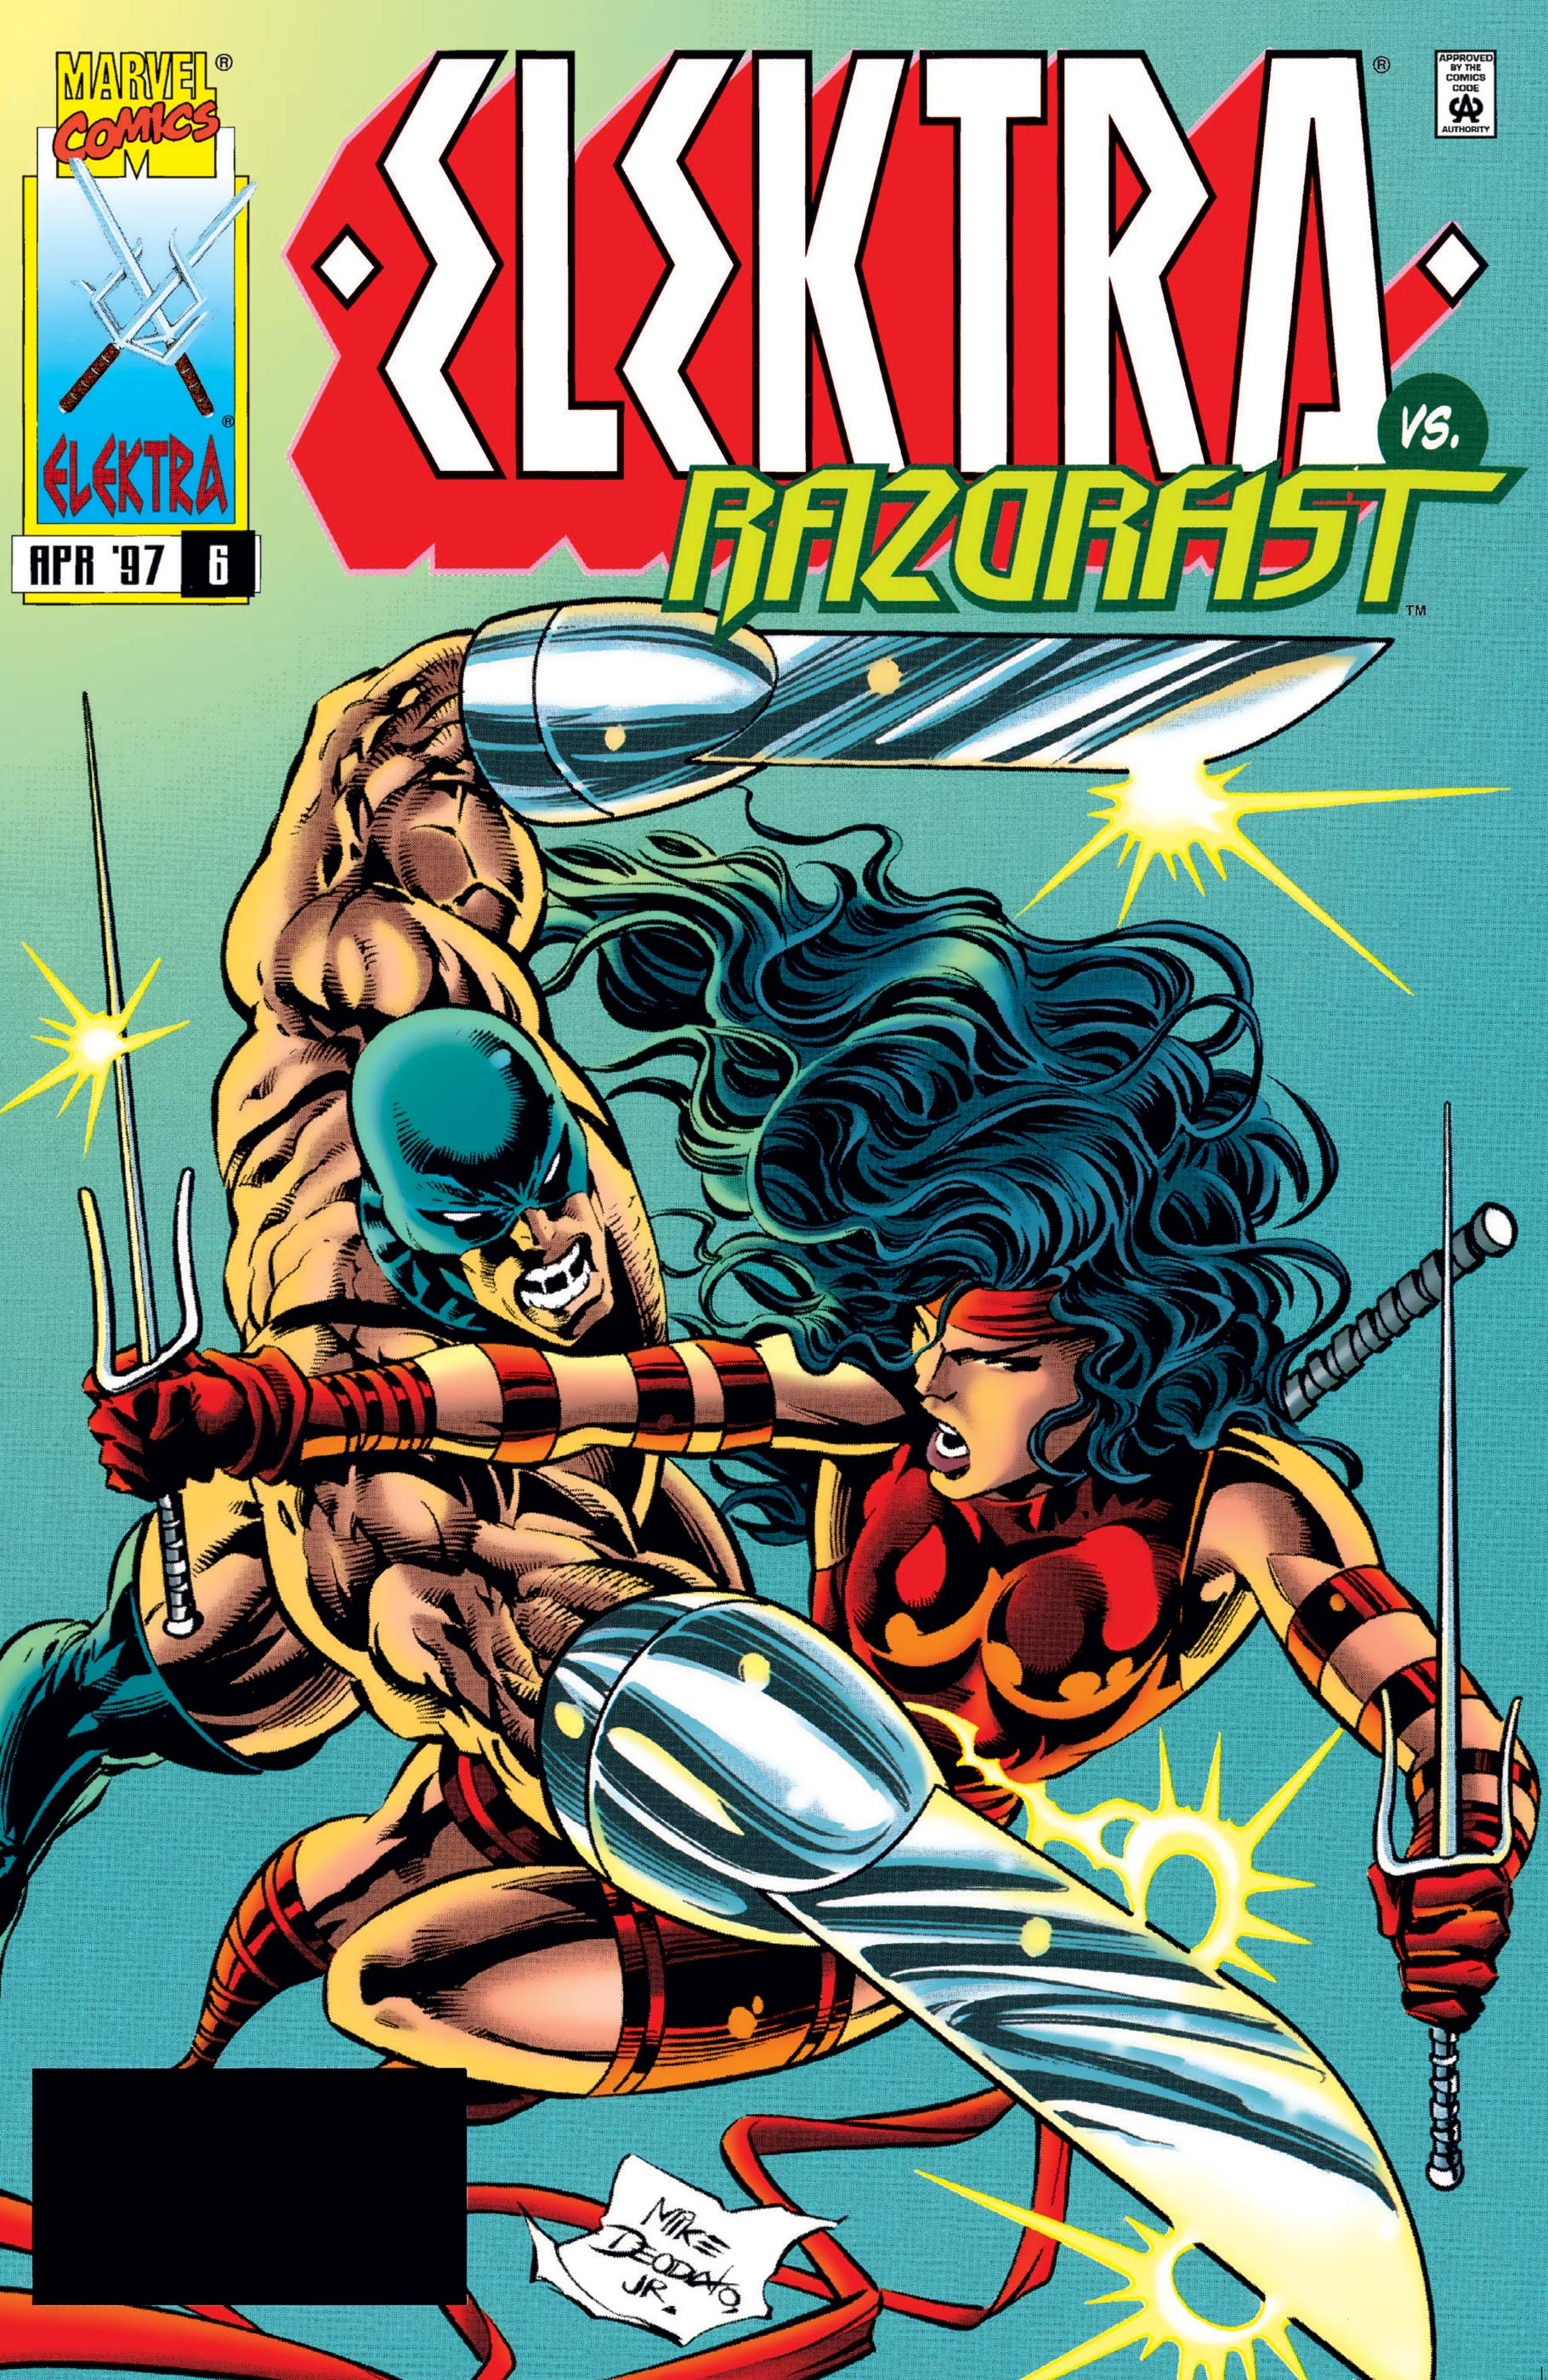 Elektra (1996) #6